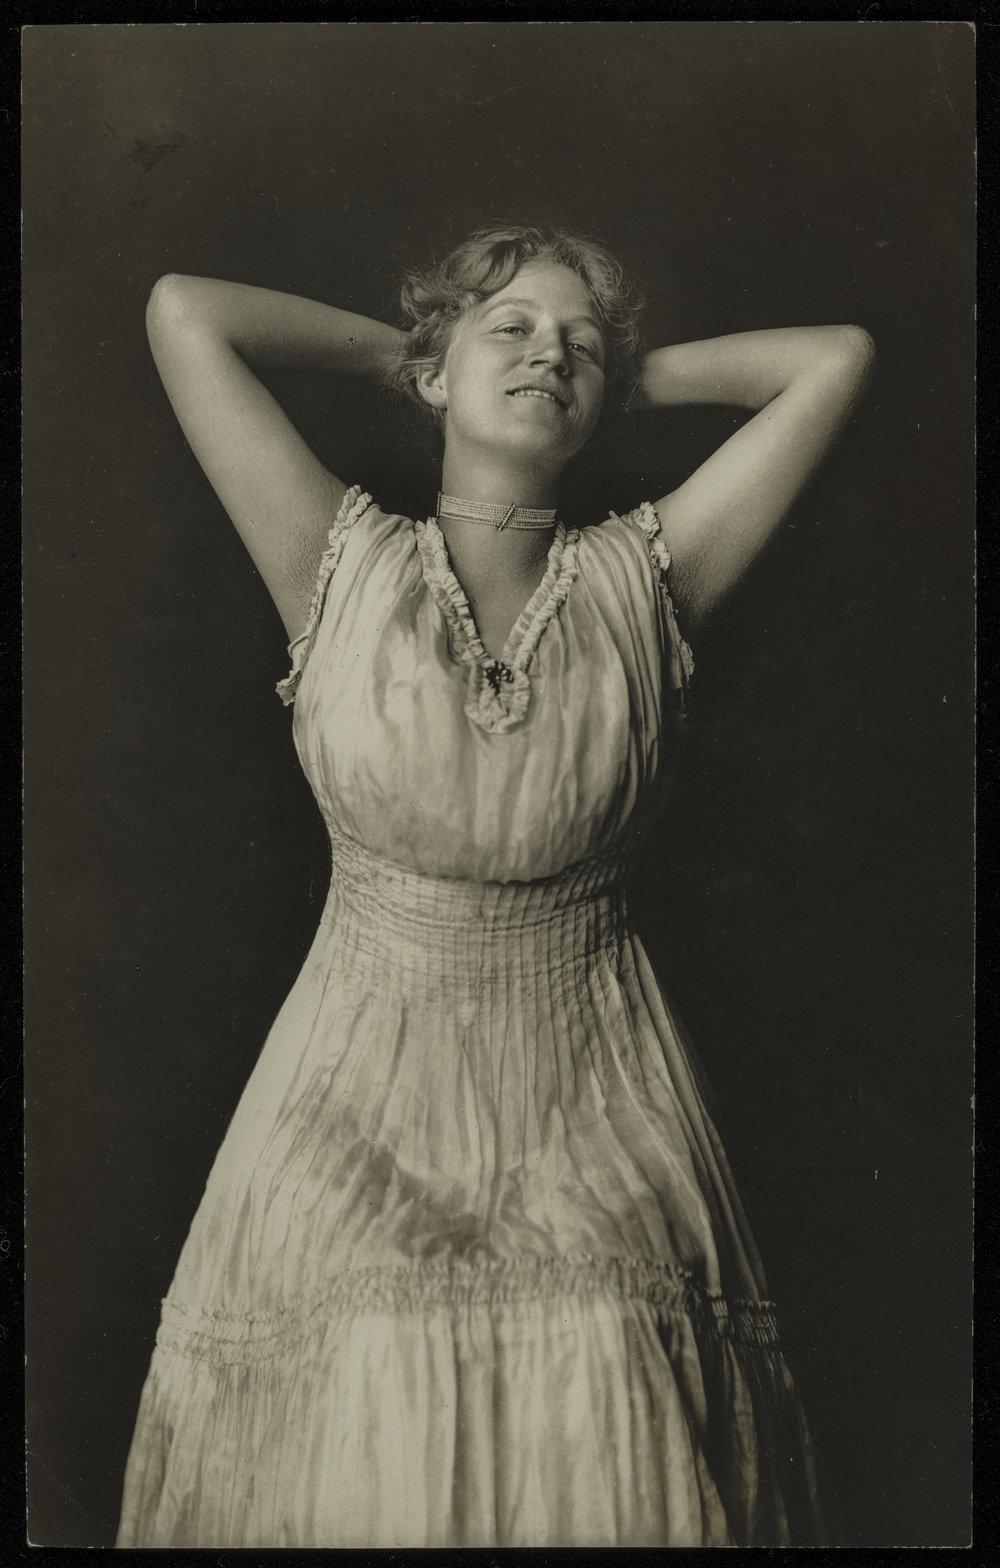 Flora Chandler Weston, The Lane Collection, Photograph © Museum of Fine Arts, Boston